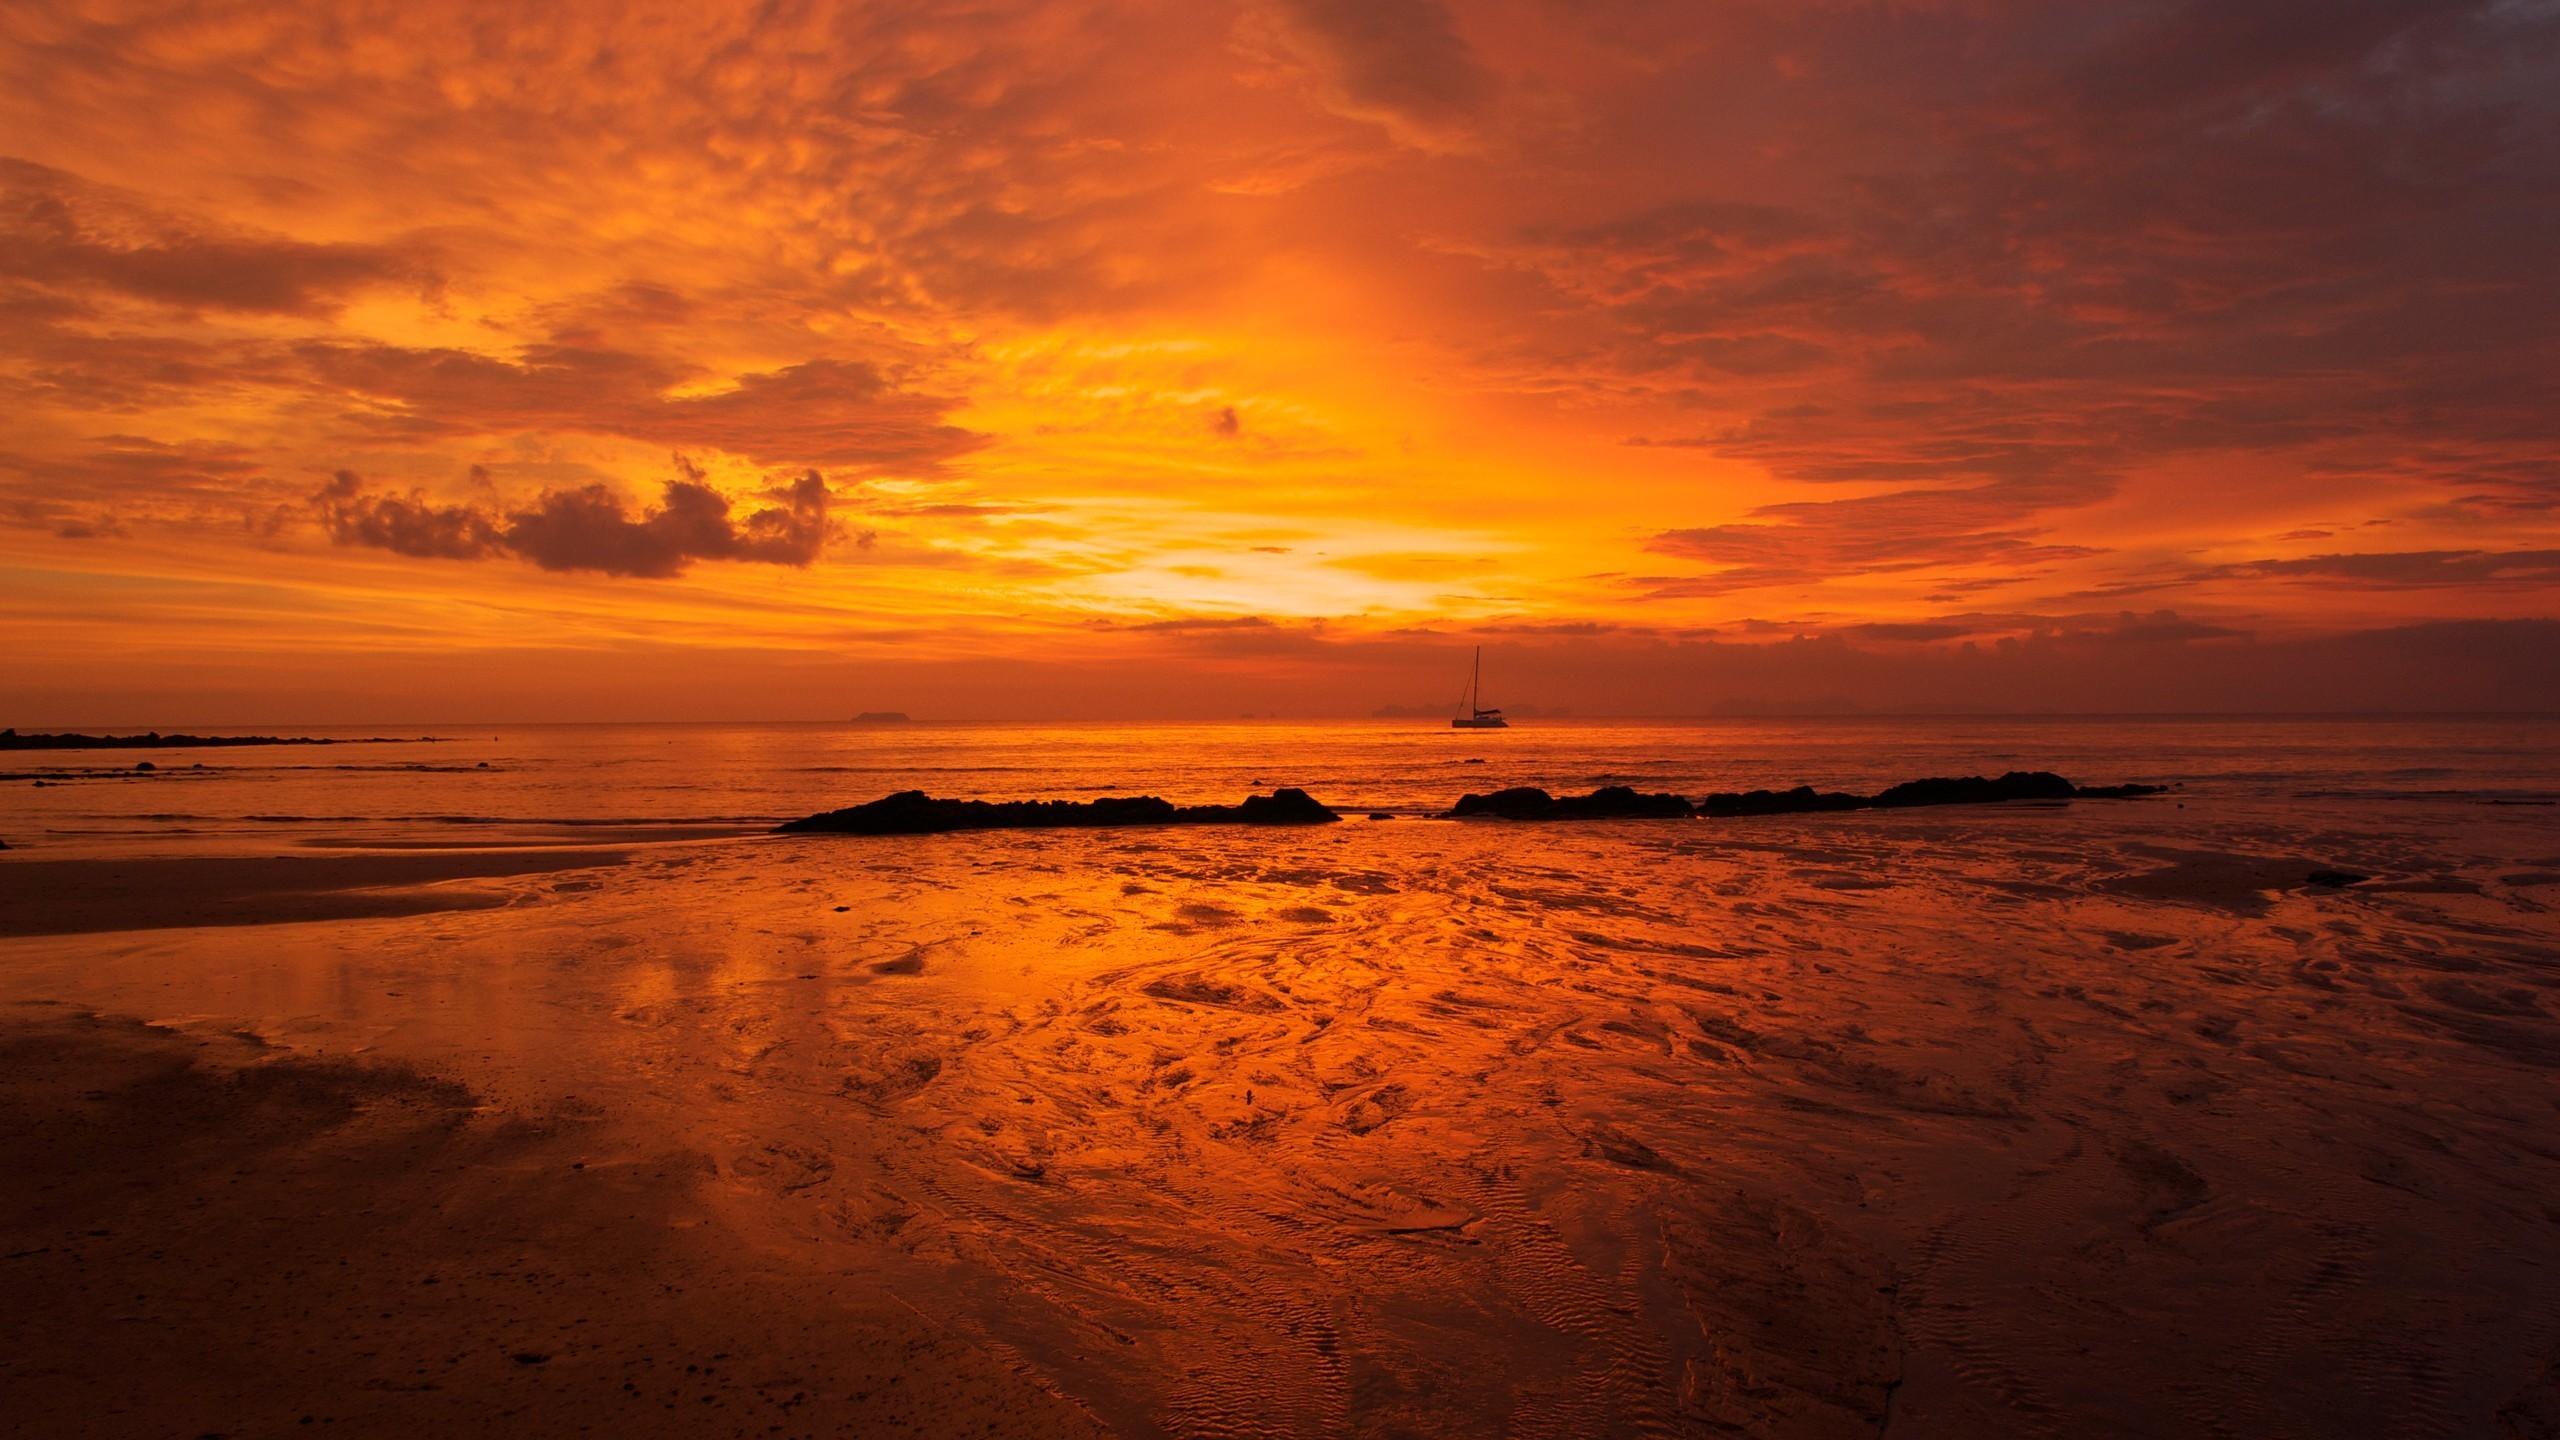 General 2560x1440 landscape nature sunset sea beach clouds sky sunlight